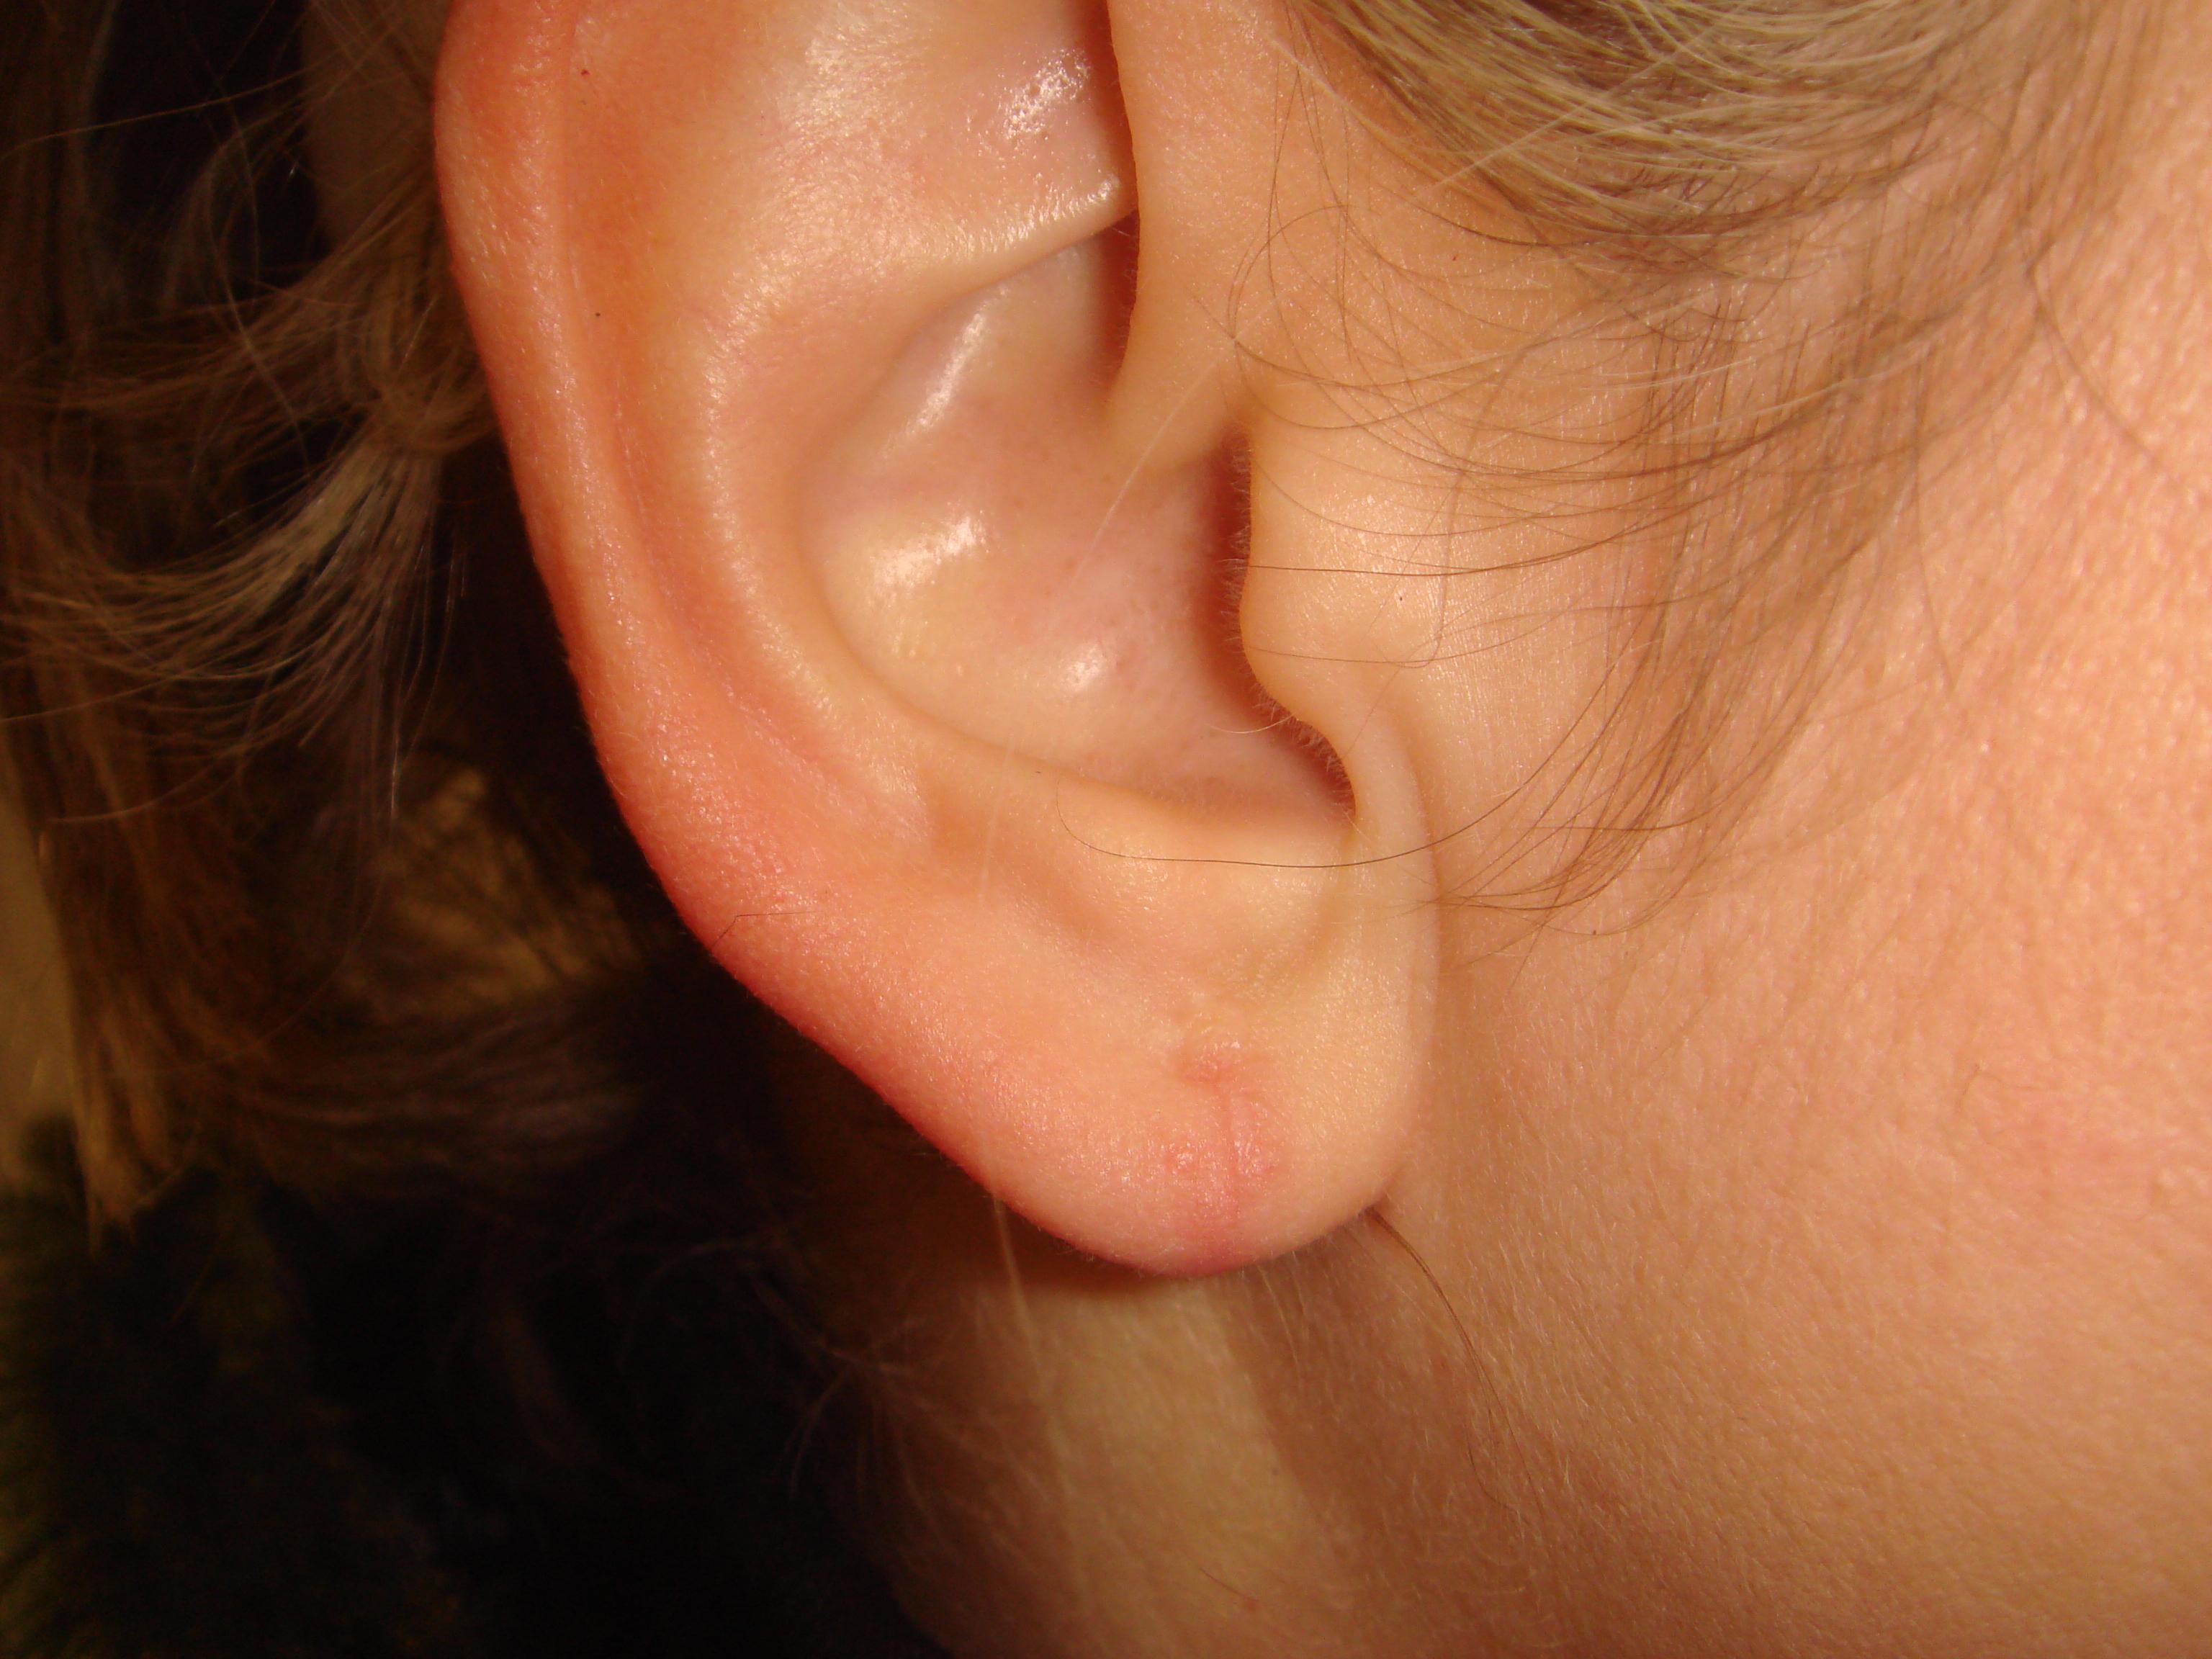 rash on earlobe - MedHelp